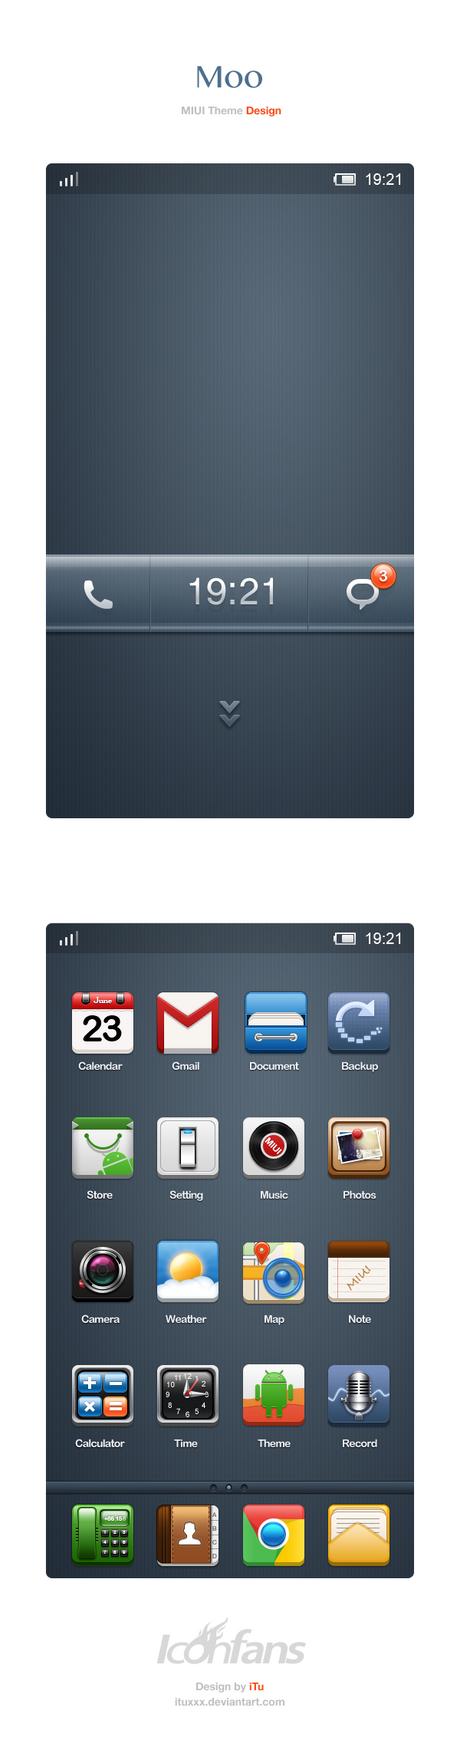 Gmail theme gallery - Ituxxx 33 7 Moo Miui Theme Design By Ituxxx